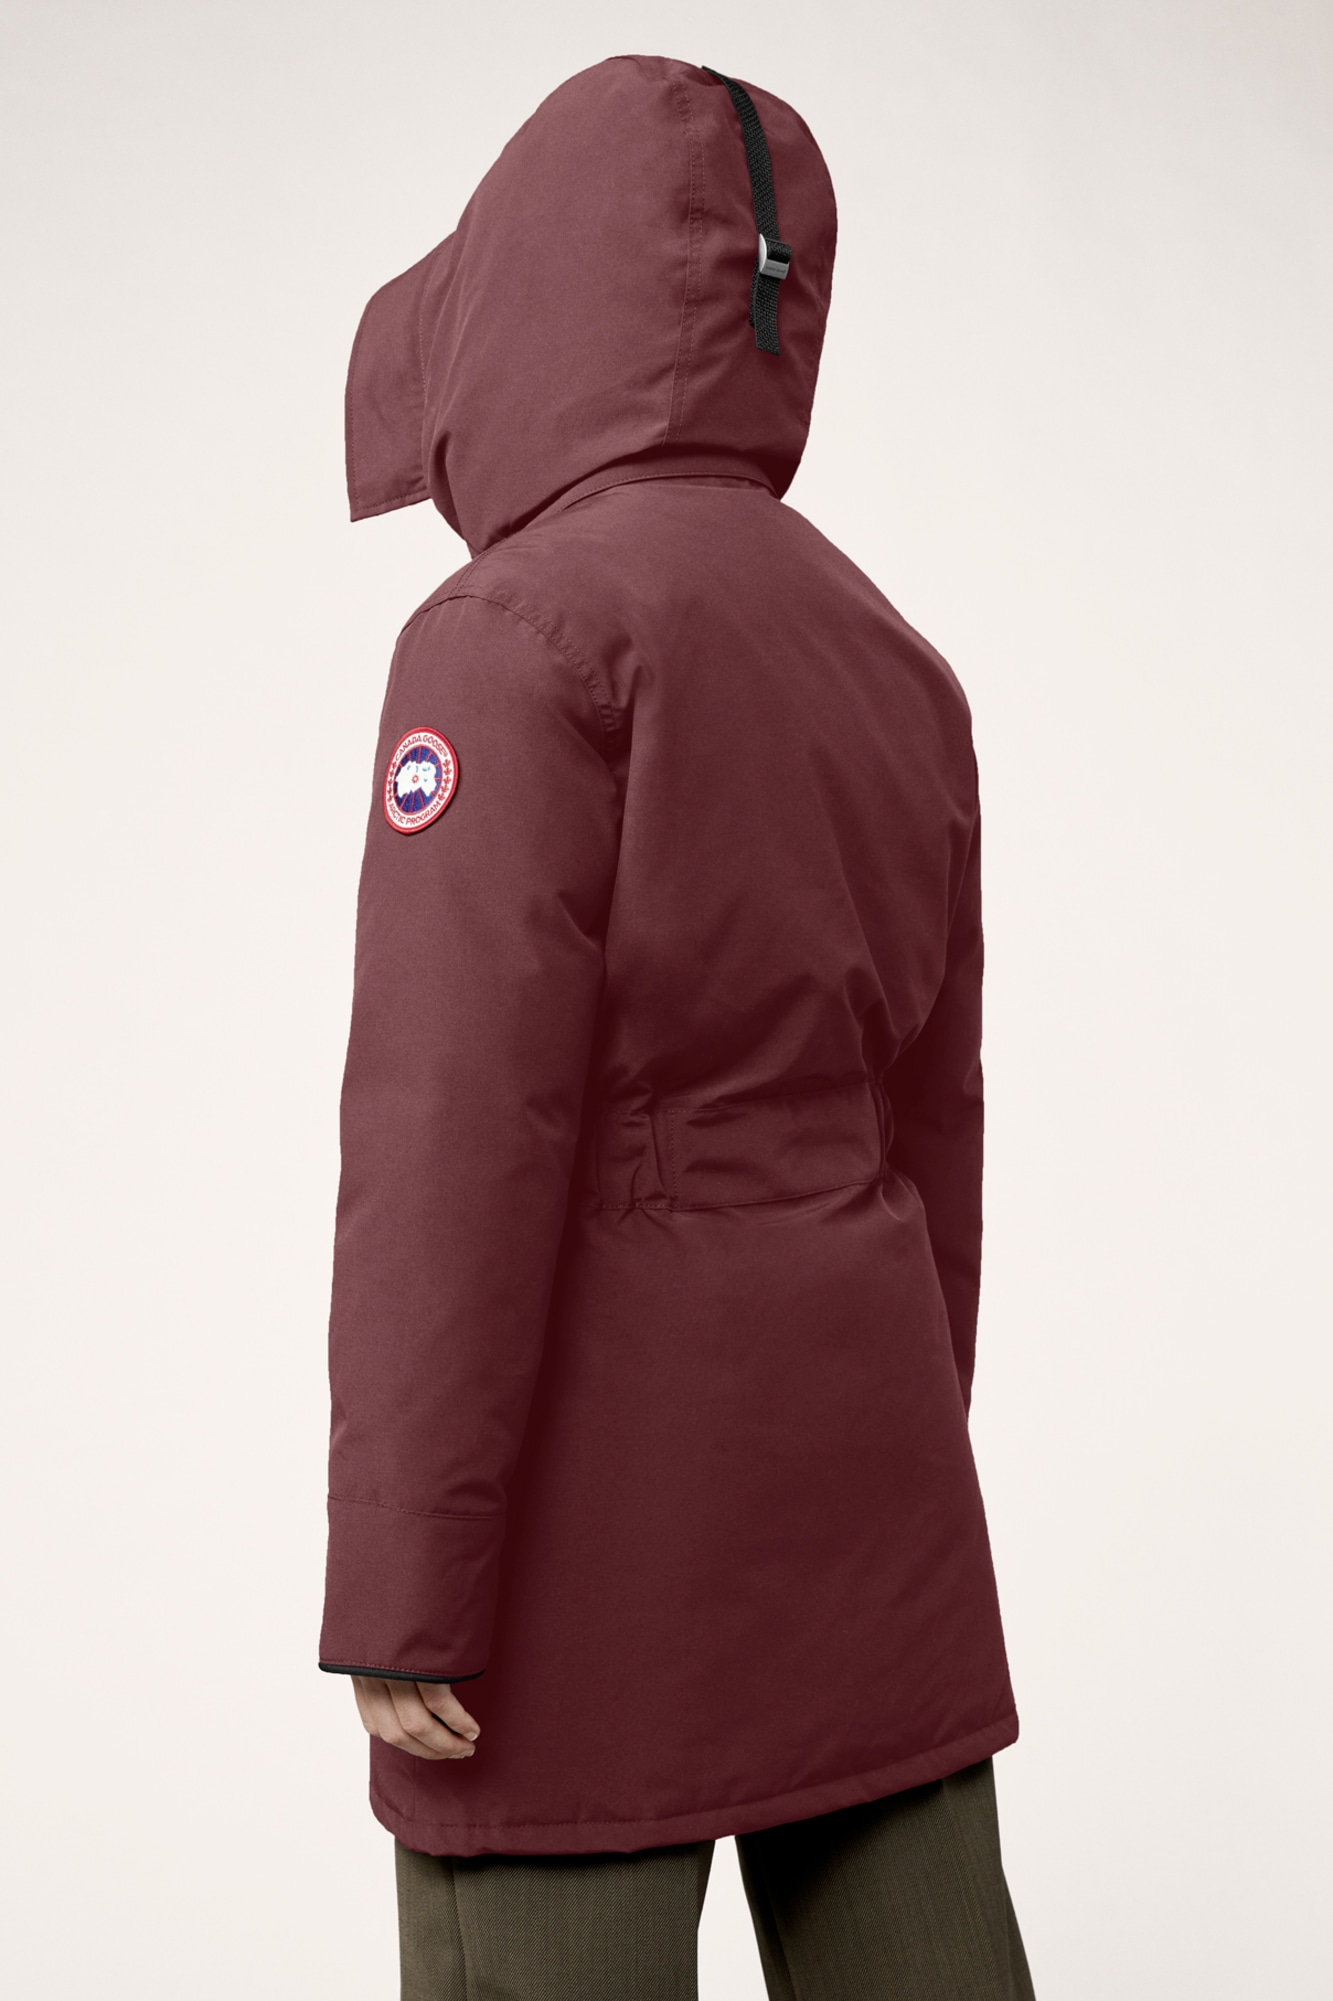 Canada Goose Damen Mäntel Top Marken Kensington Parka Women